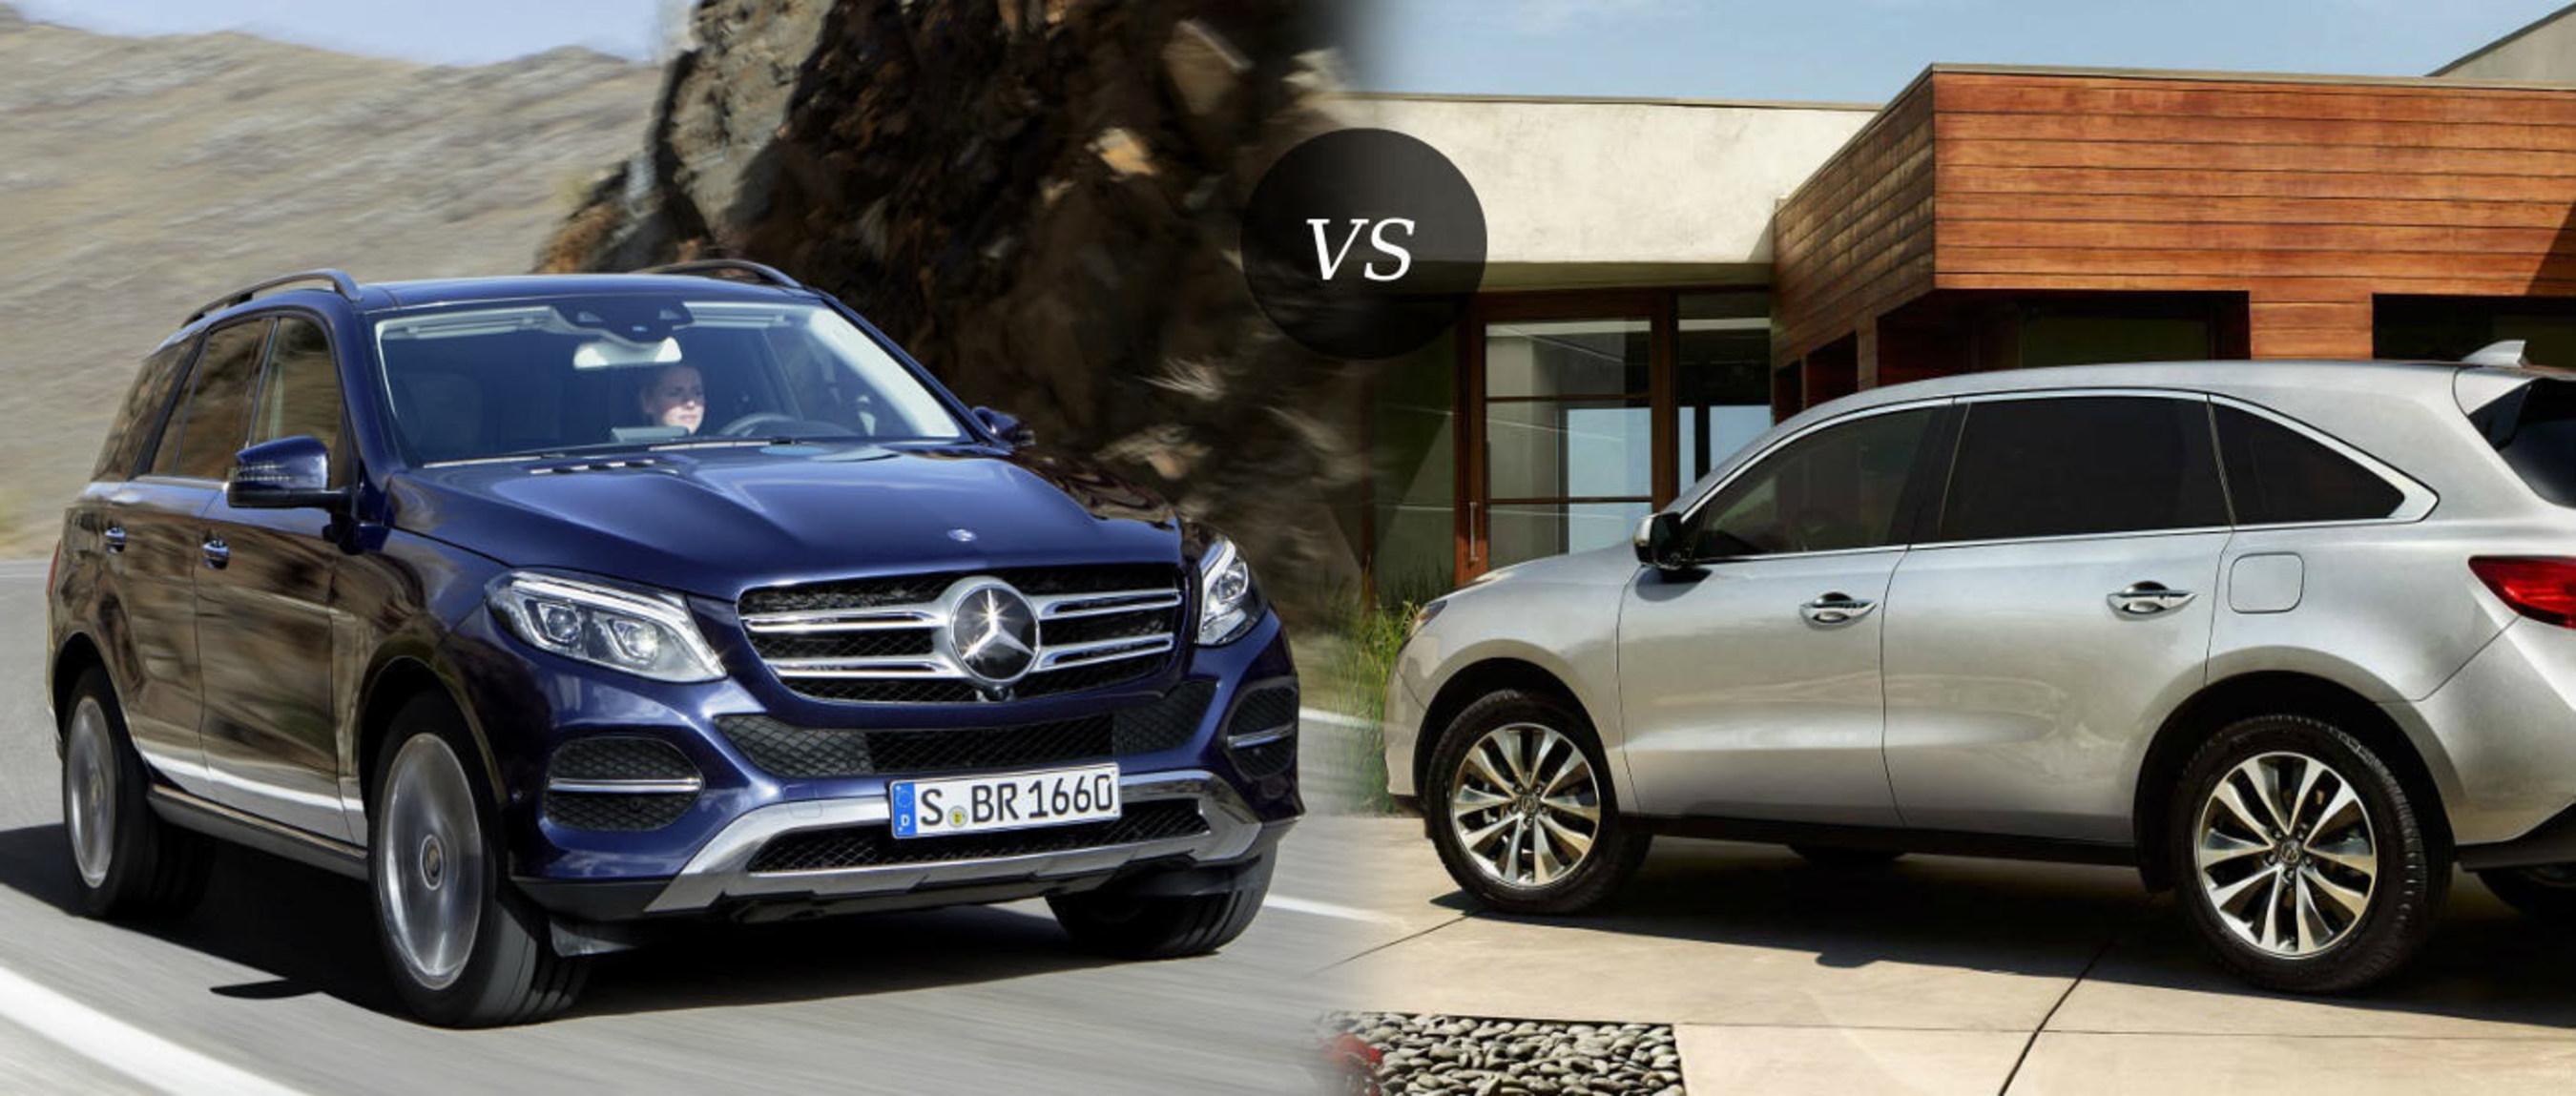 Loeber Motors puts new Mercedes-Benz GLE against Acura MDX in 2016 model comparison